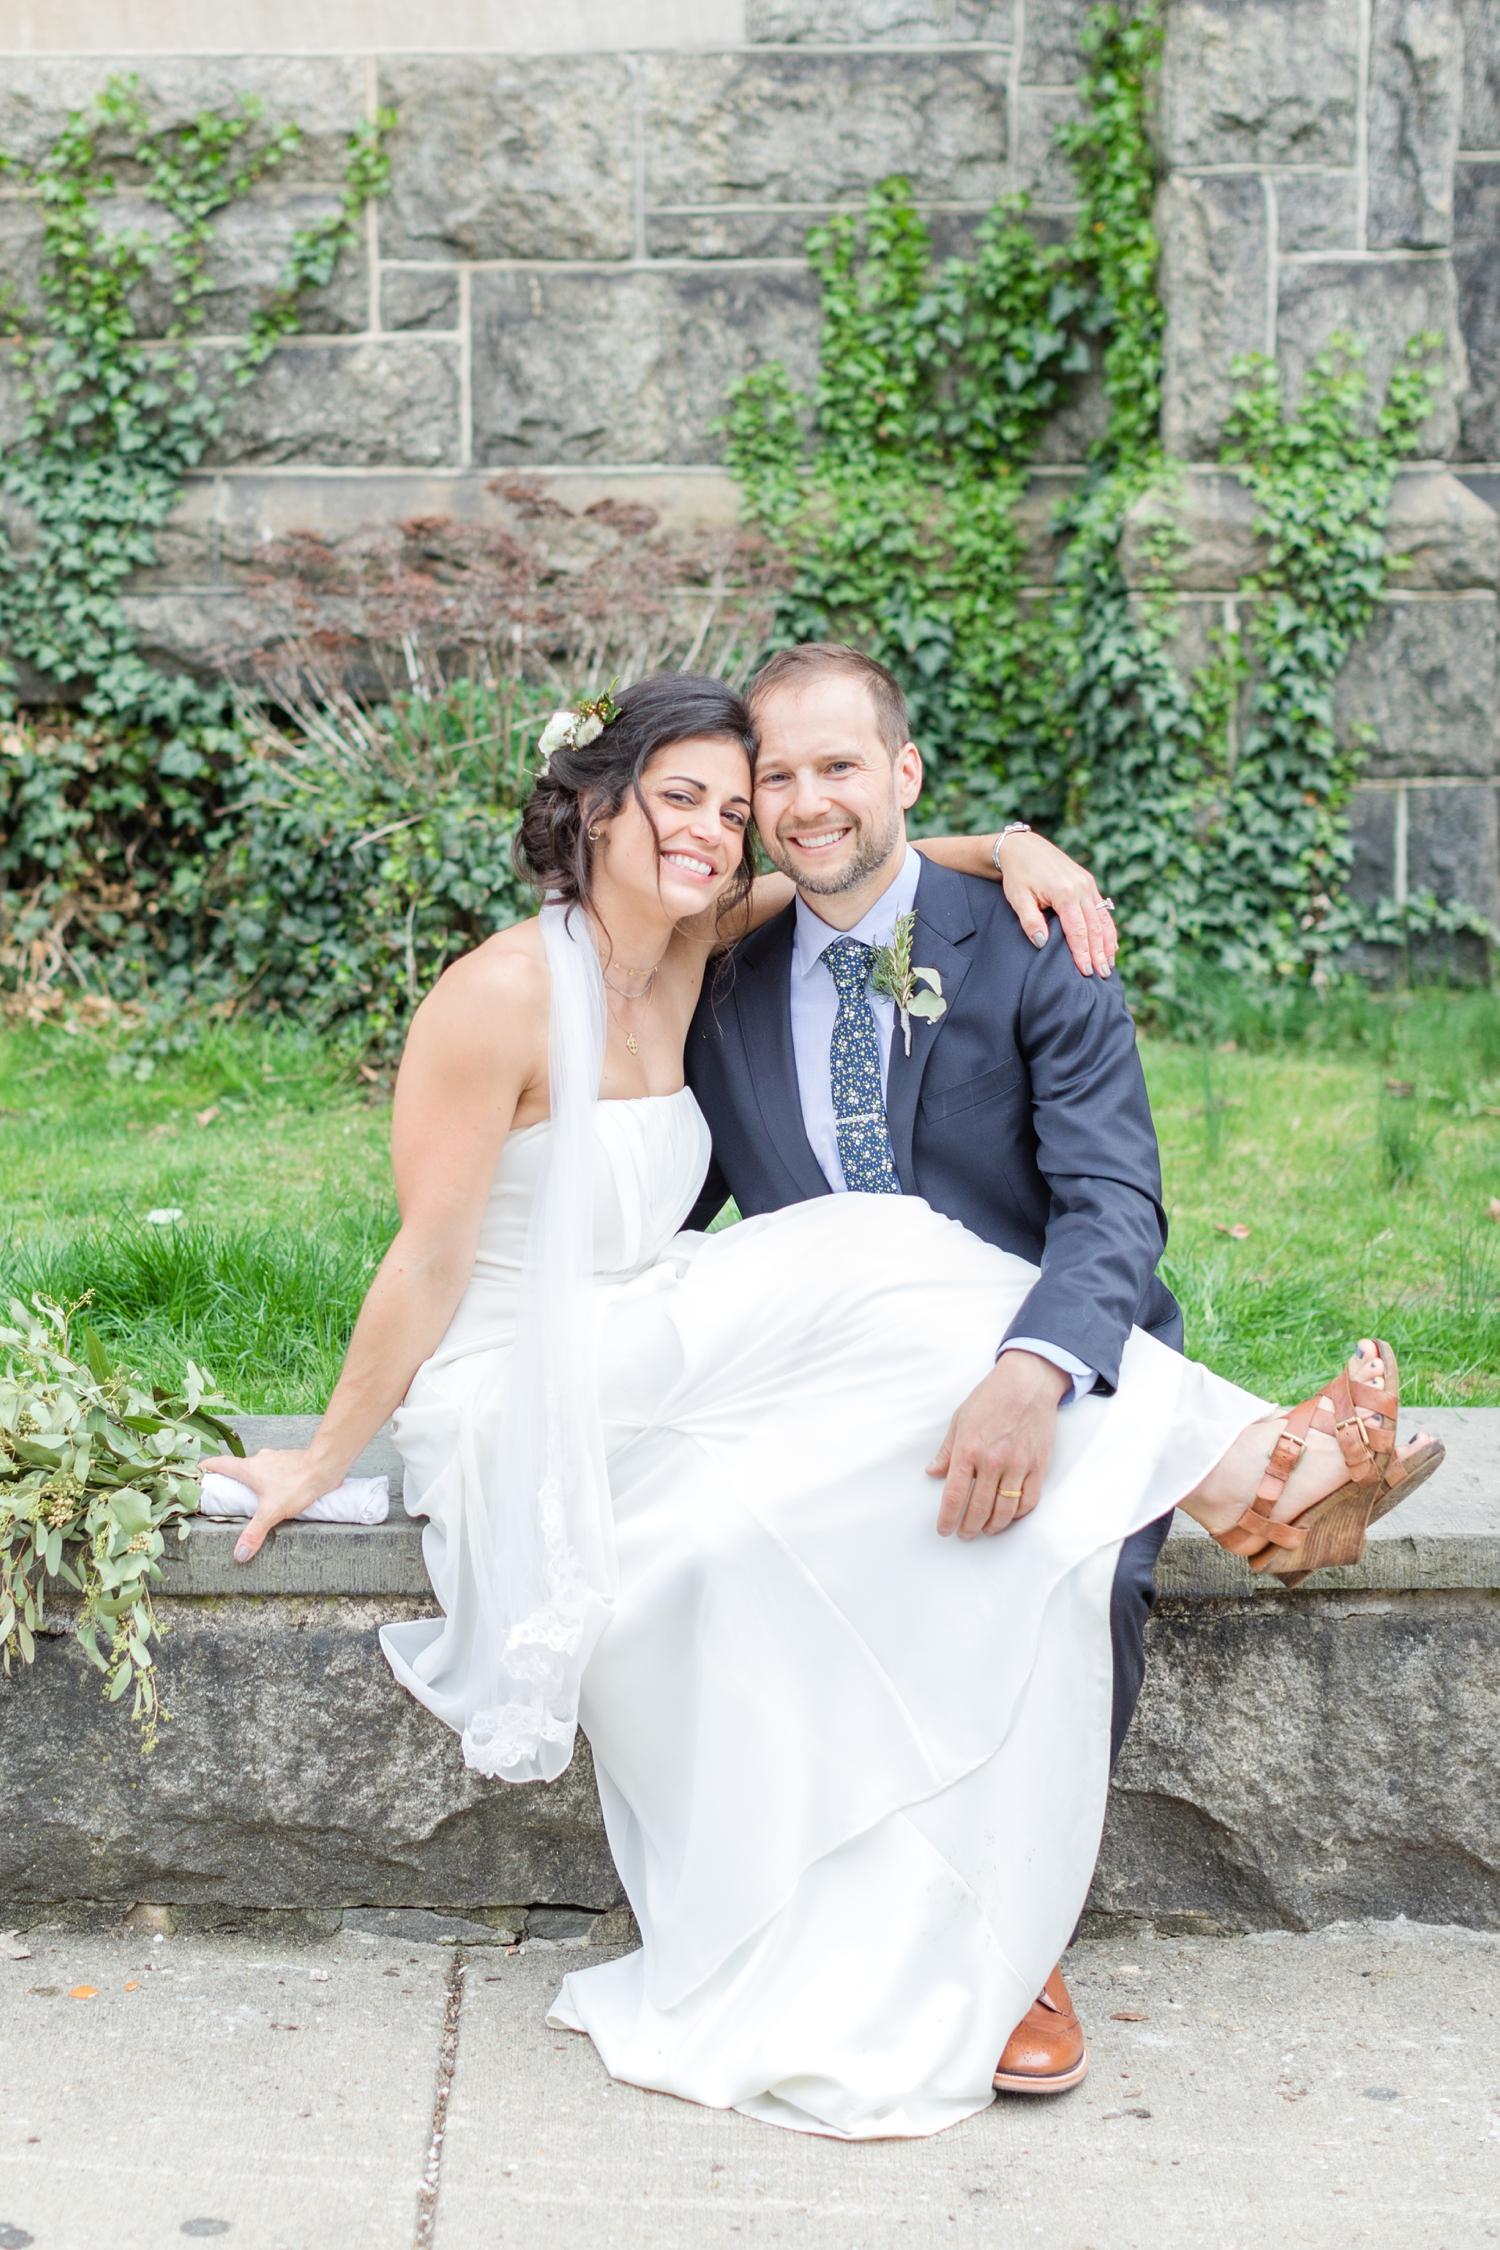 Matt & Angel Skarzynski Wedding WEDDING HIGHLIGHTS-195_2640-Space-wedding-Baltimore-Maryland-wedding-photographer-Patapsco-State-Park-engagement-anna-grace-photography-photo.jpg